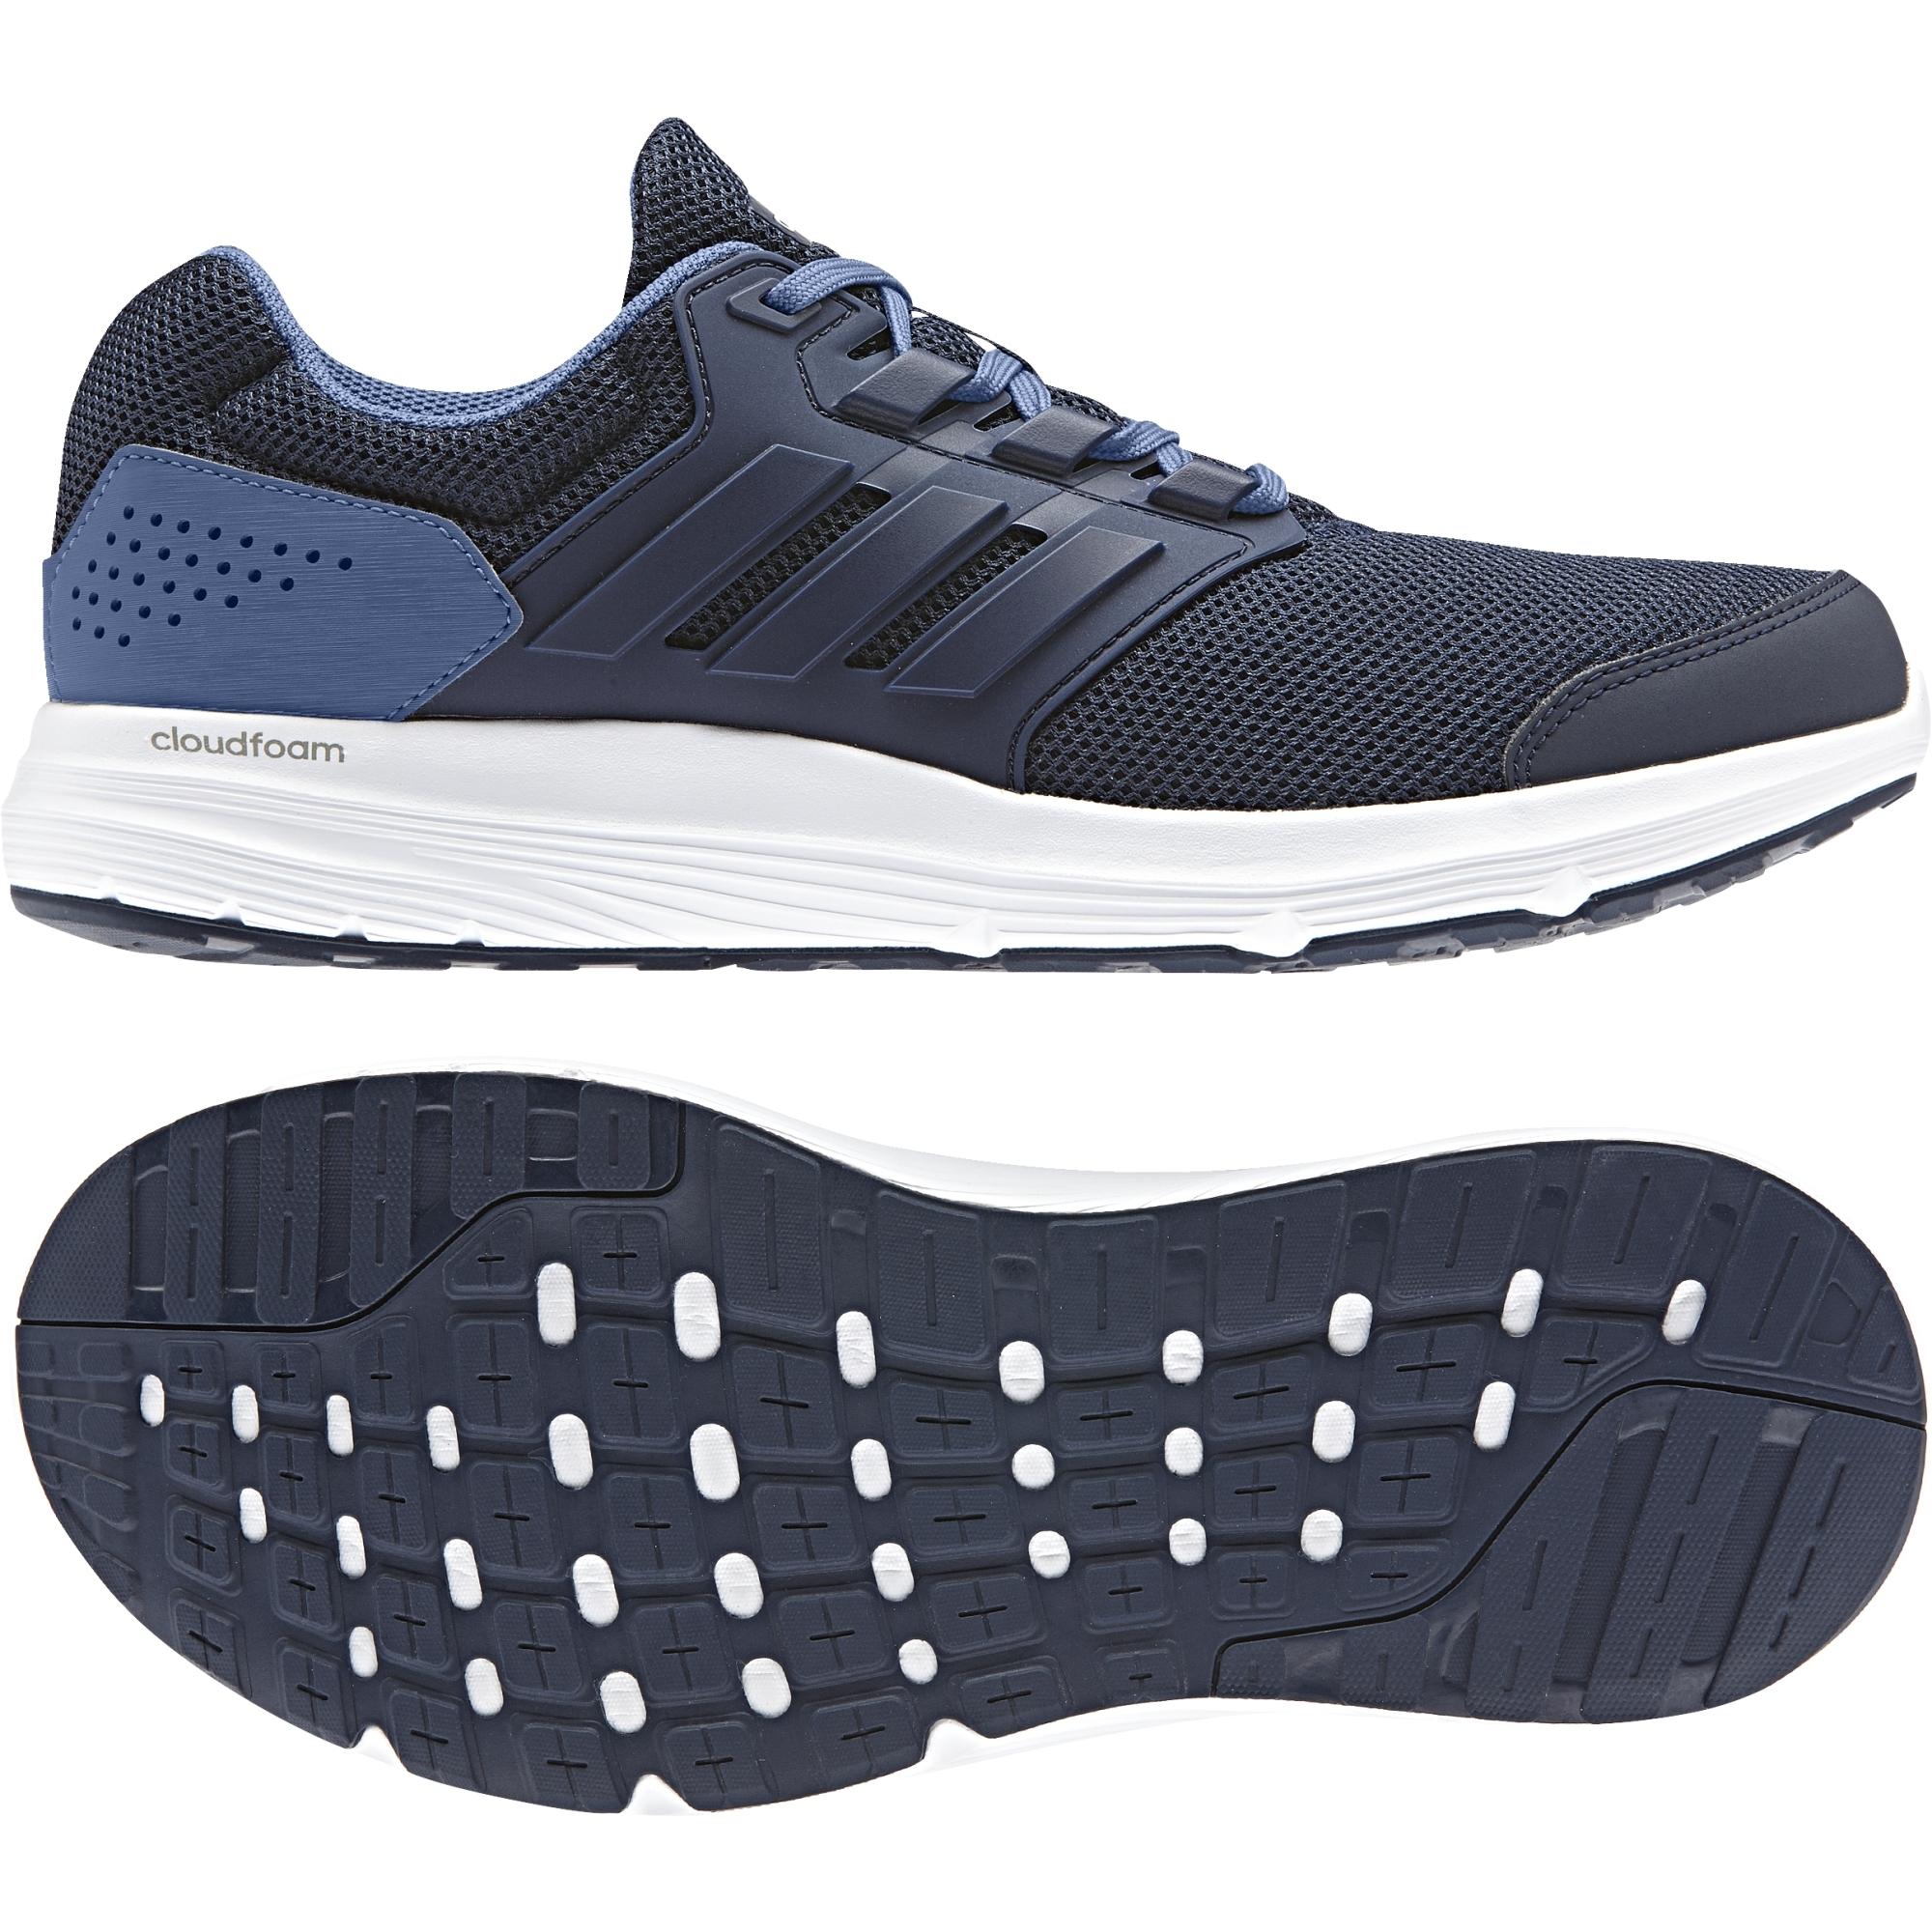 Adidas Chaussures 4 Chaussures 4 Adidas Galaxy Chaussures Adidas Galaxy Chaussures 4 Galaxy wOXZuTkliP